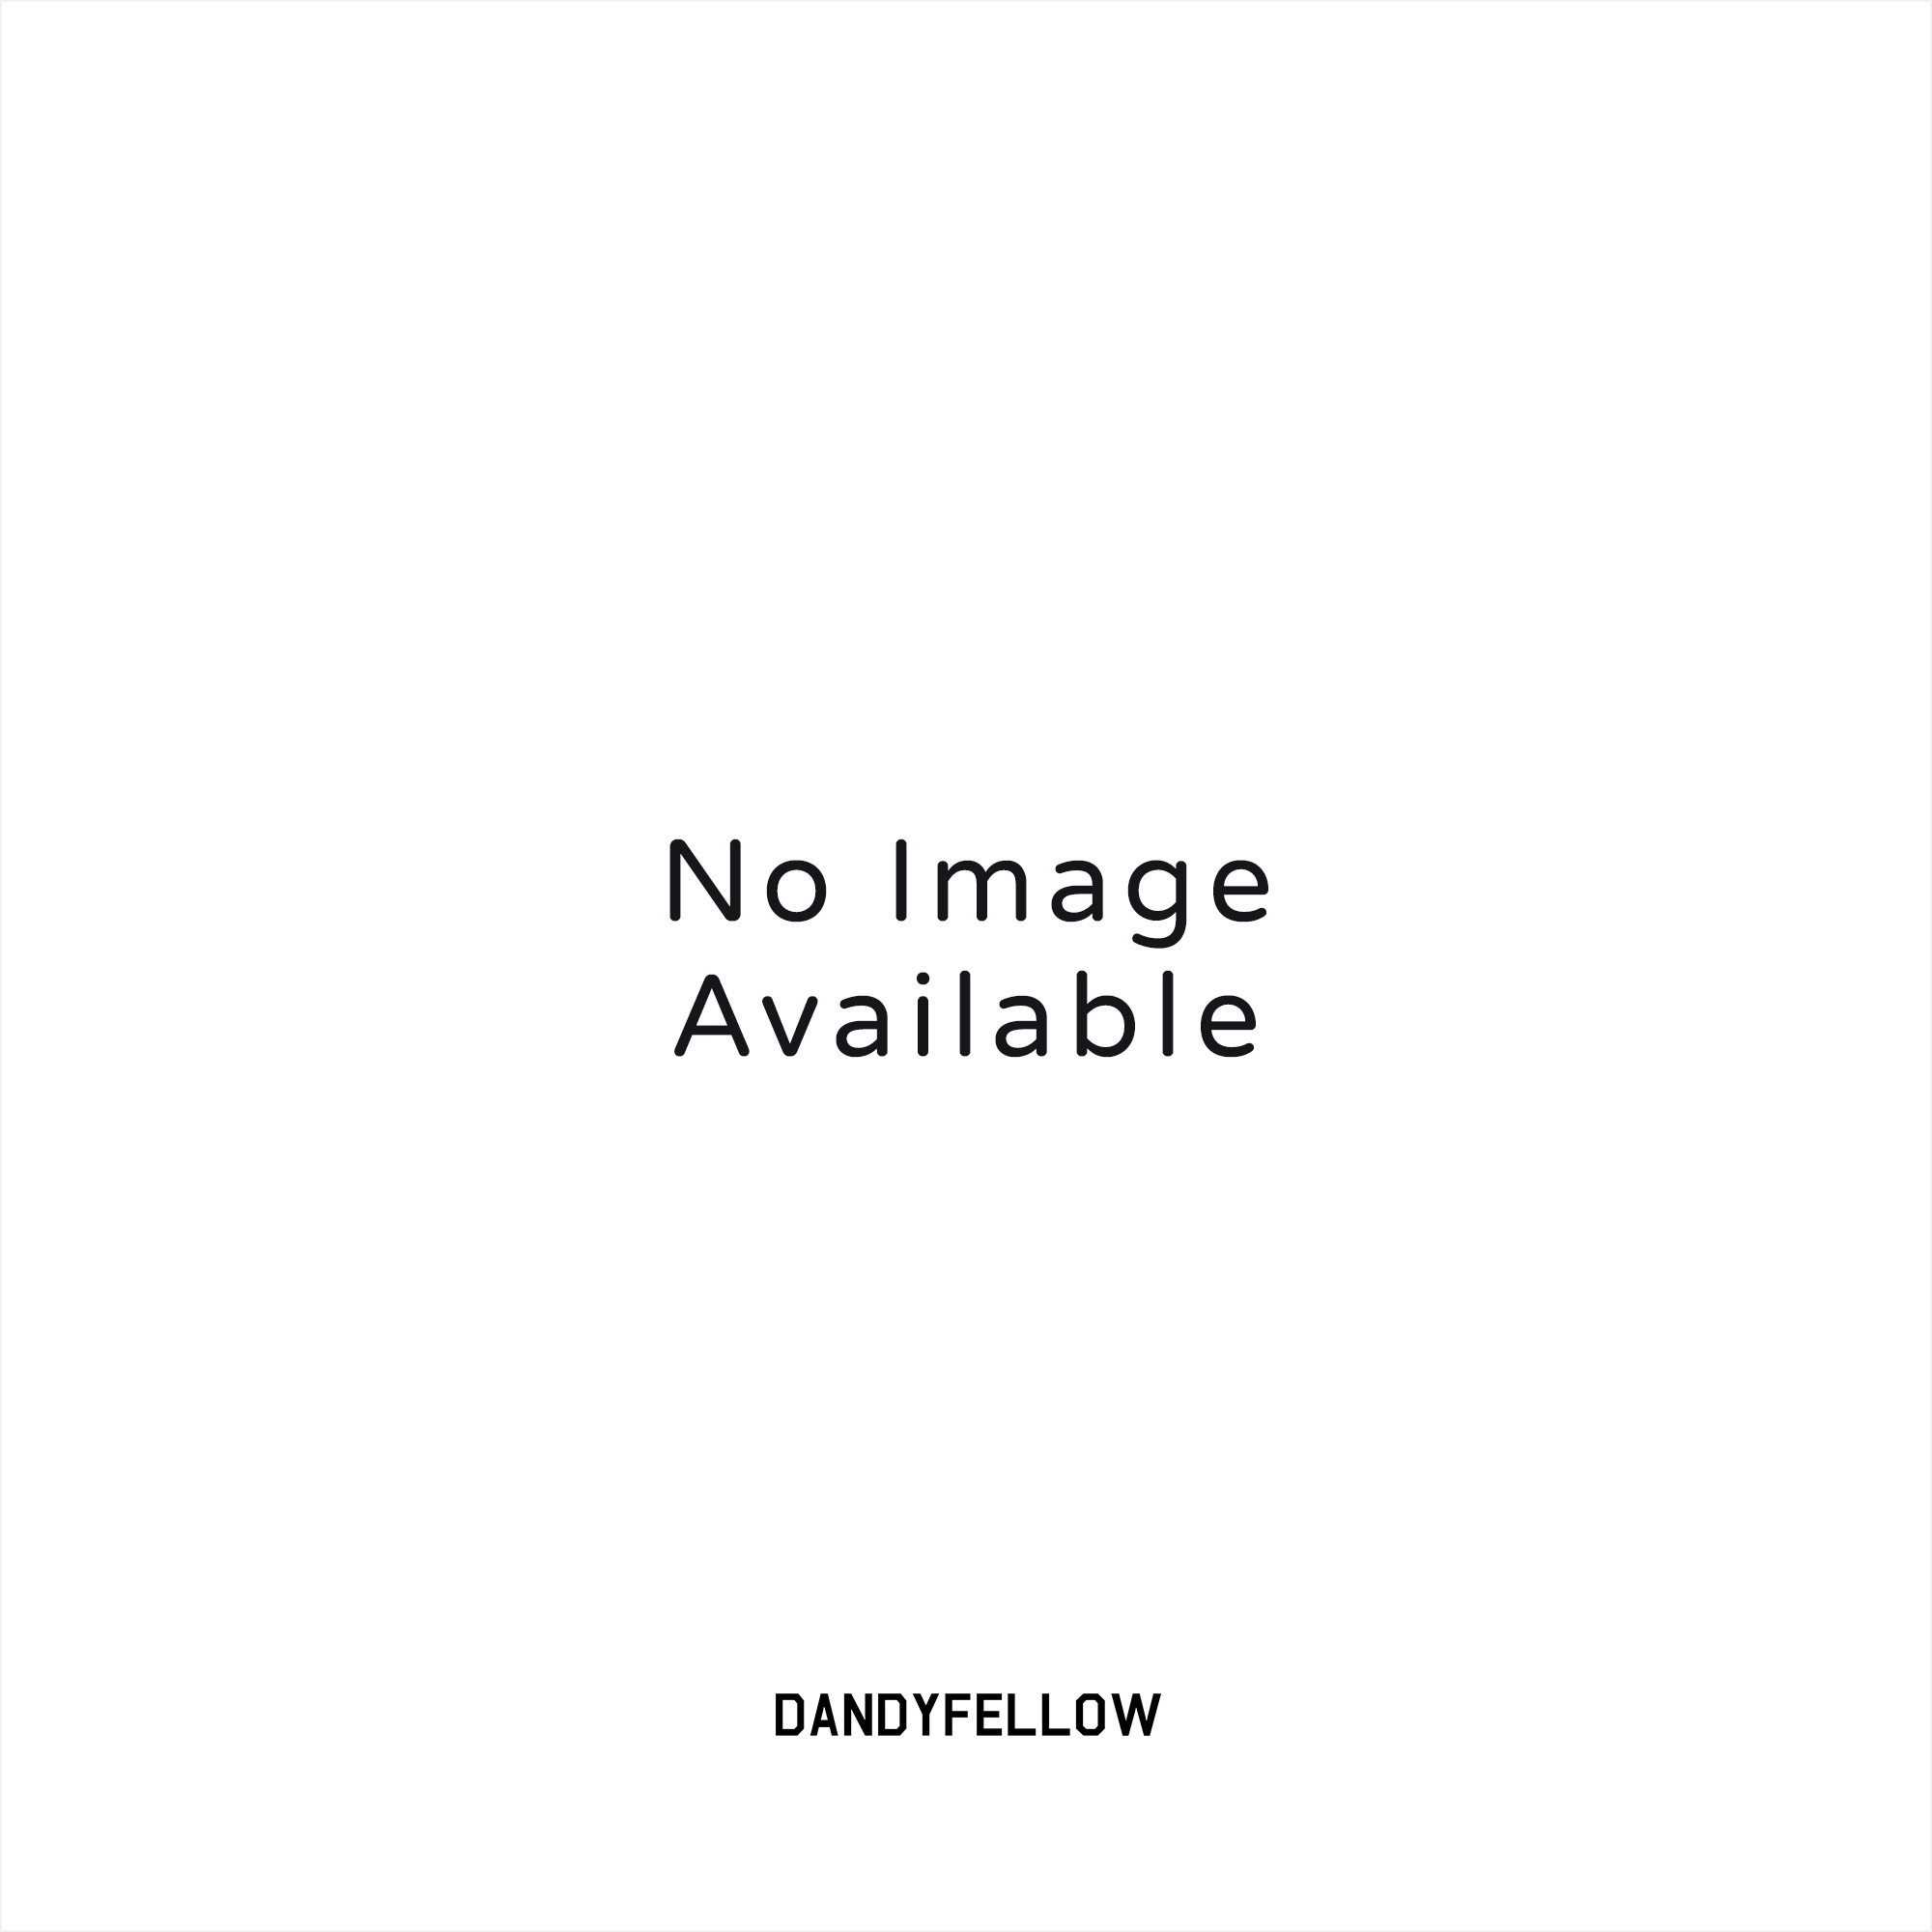 Paul Smith Zebra Dark Indigo Pique Polo Shirt JPFJ-183K-D46Z